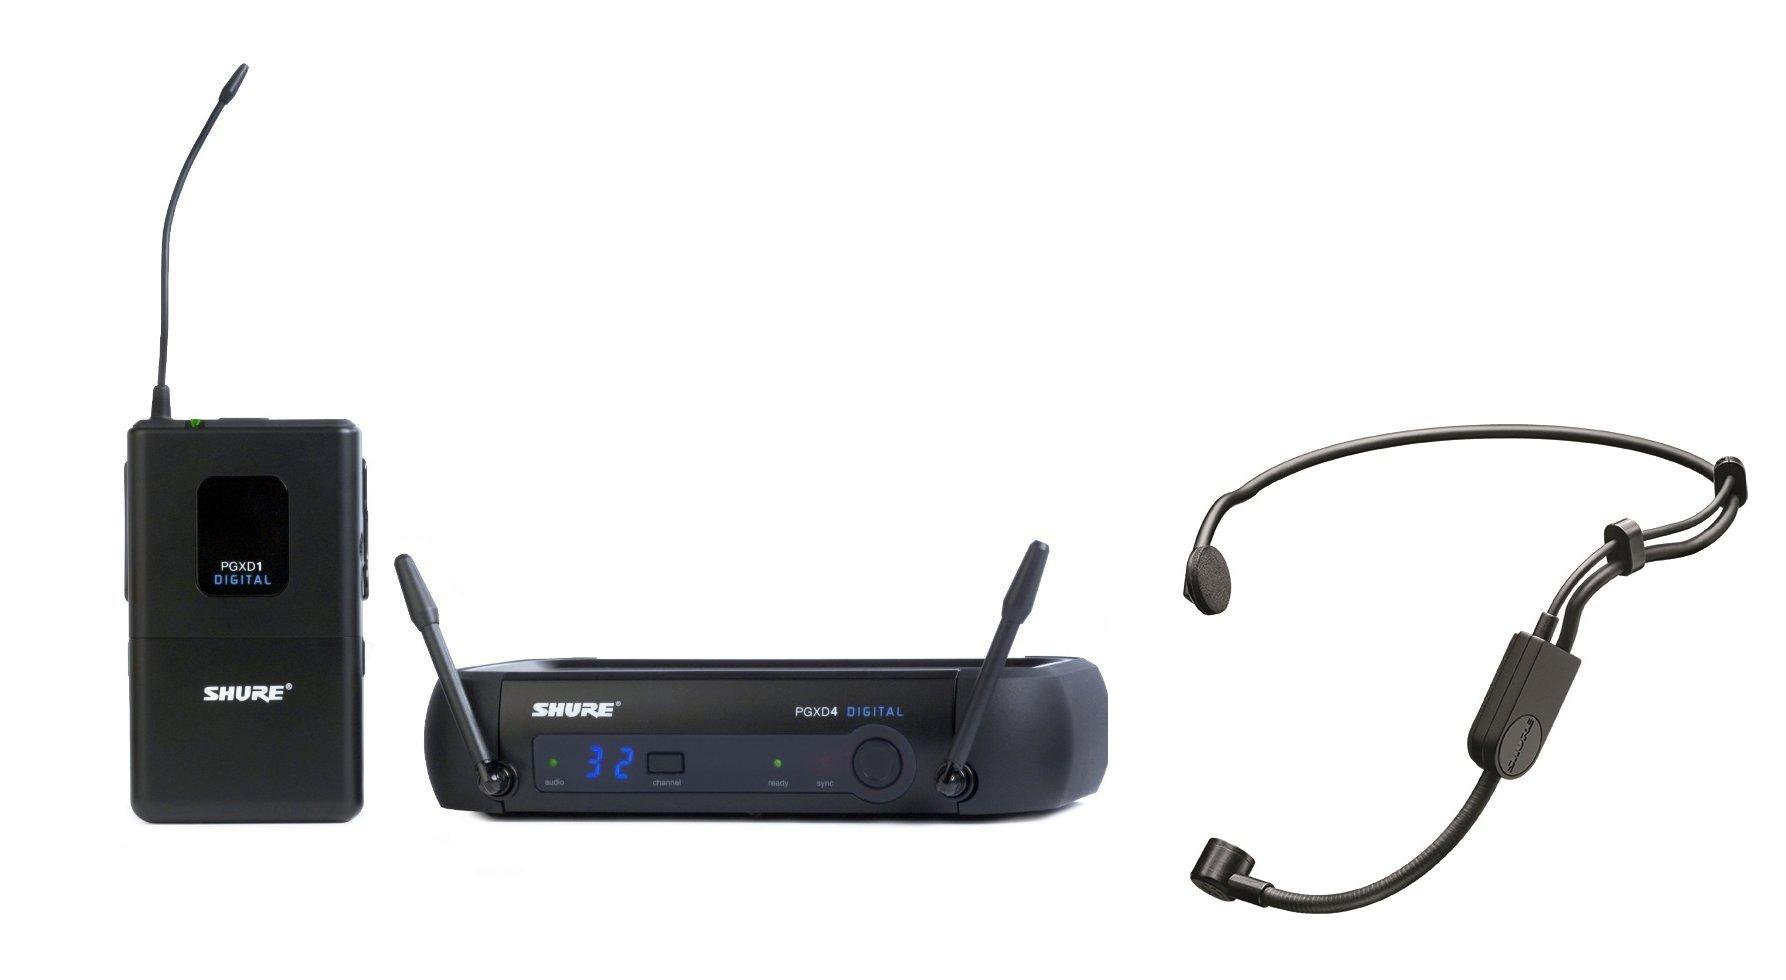 Shure PGXD14/PGA31-X8 Digital Headworn Wireless System with PGA31 Headset Microphone by Shure